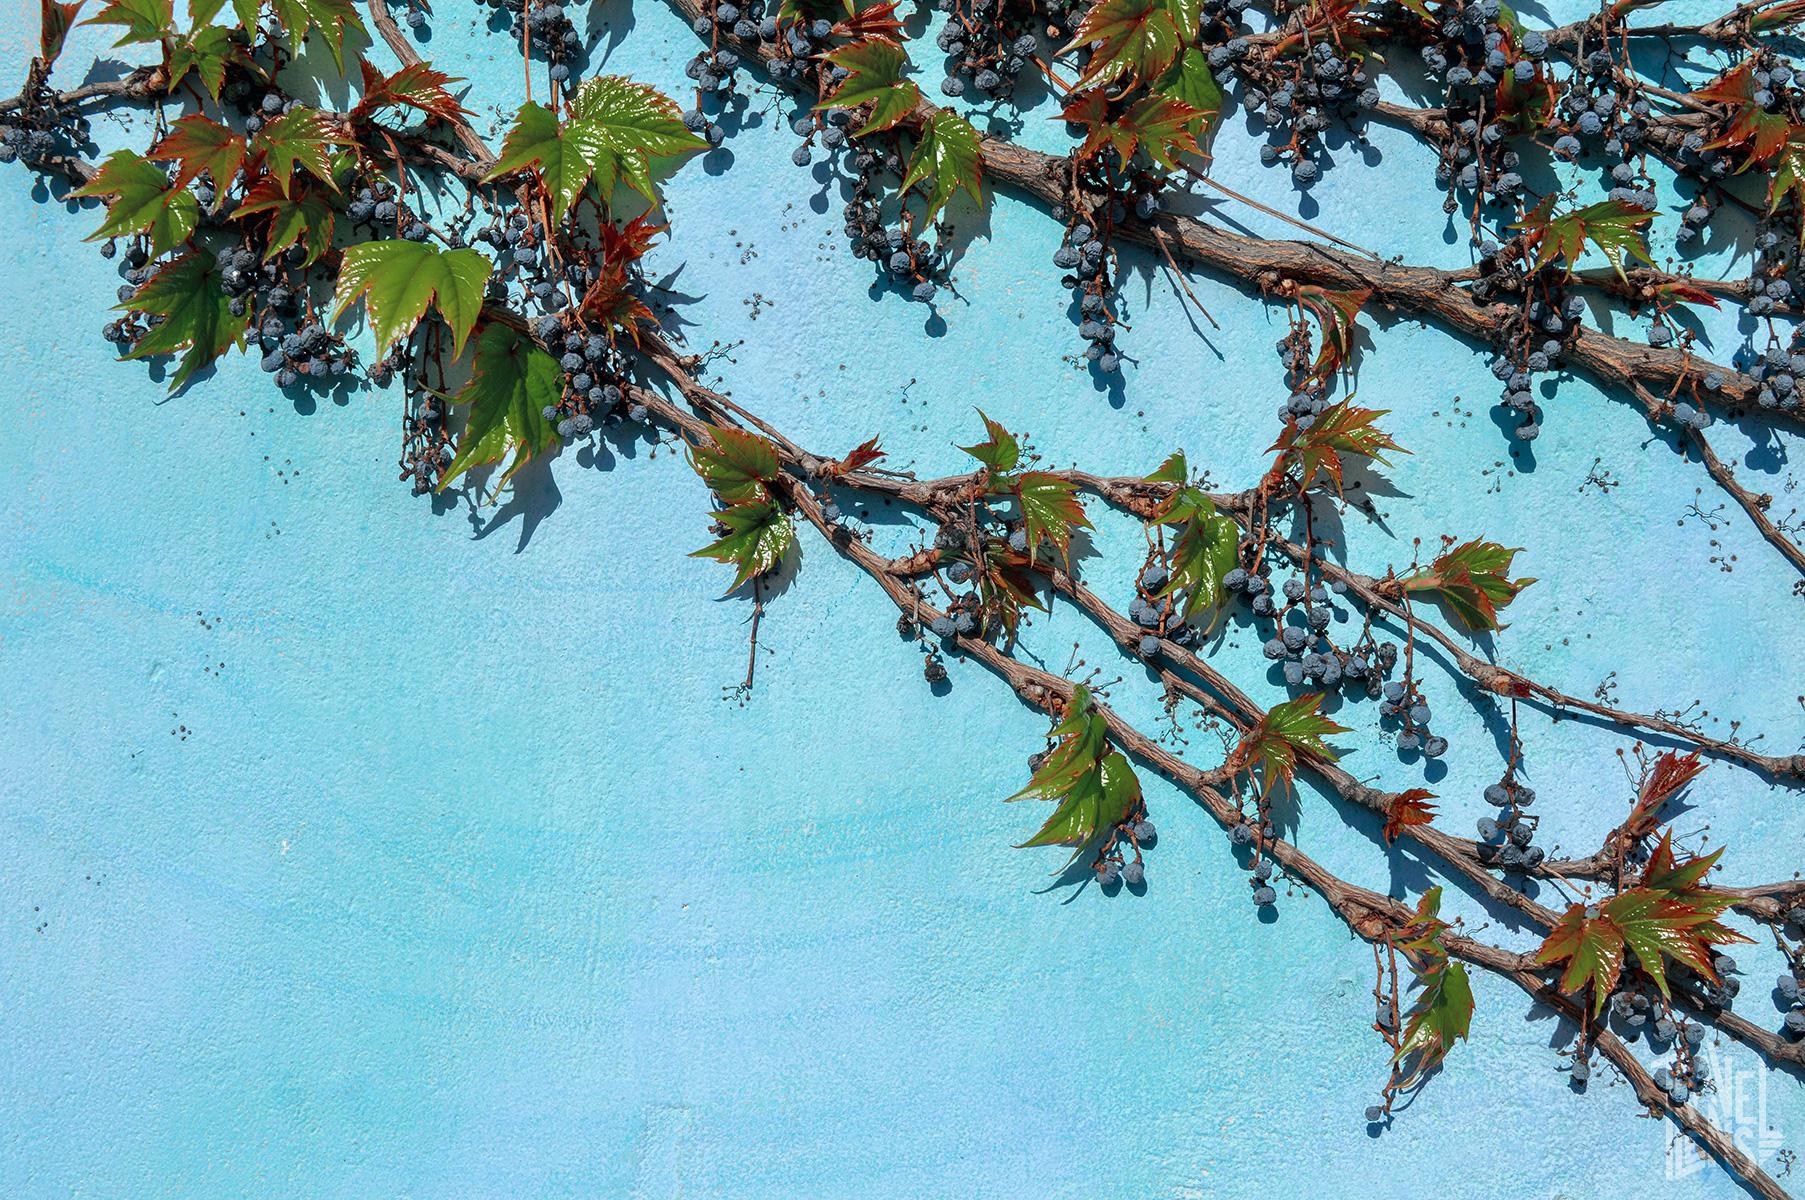 Vines on a blue building - up close